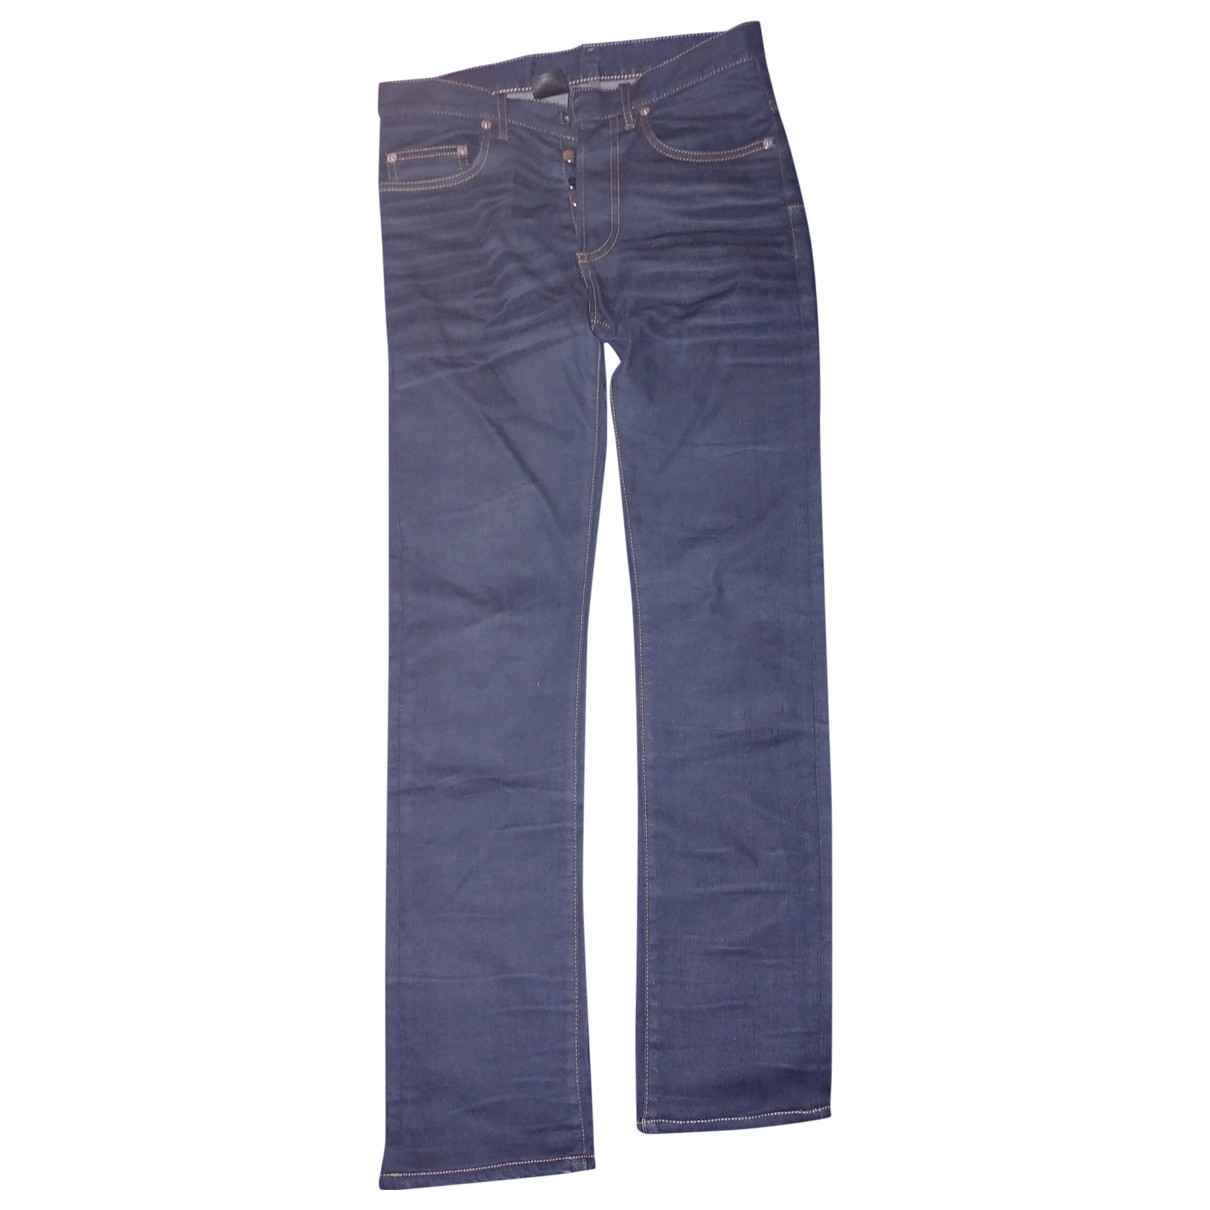 Dior Homme \N Blue Cotton - elasthane Jeans for Men 28 US